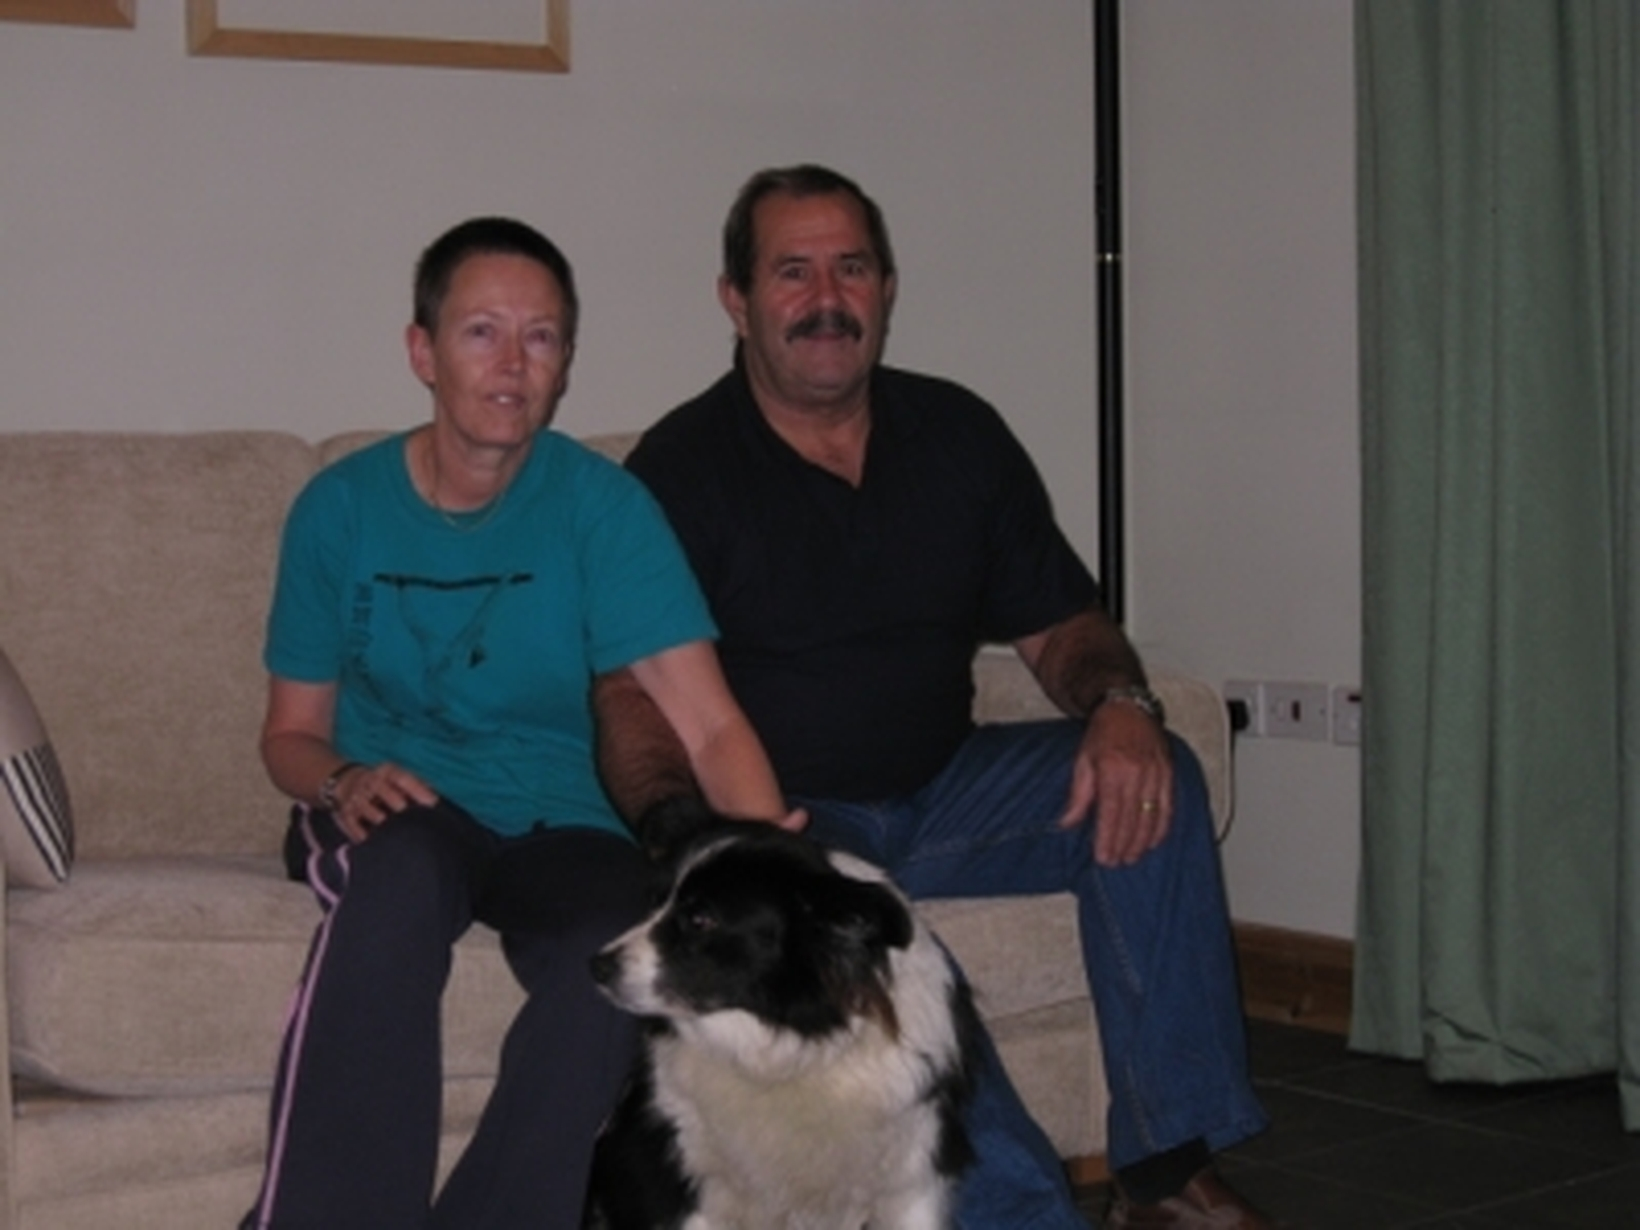 Val & Roy from Perth, WA, Australia